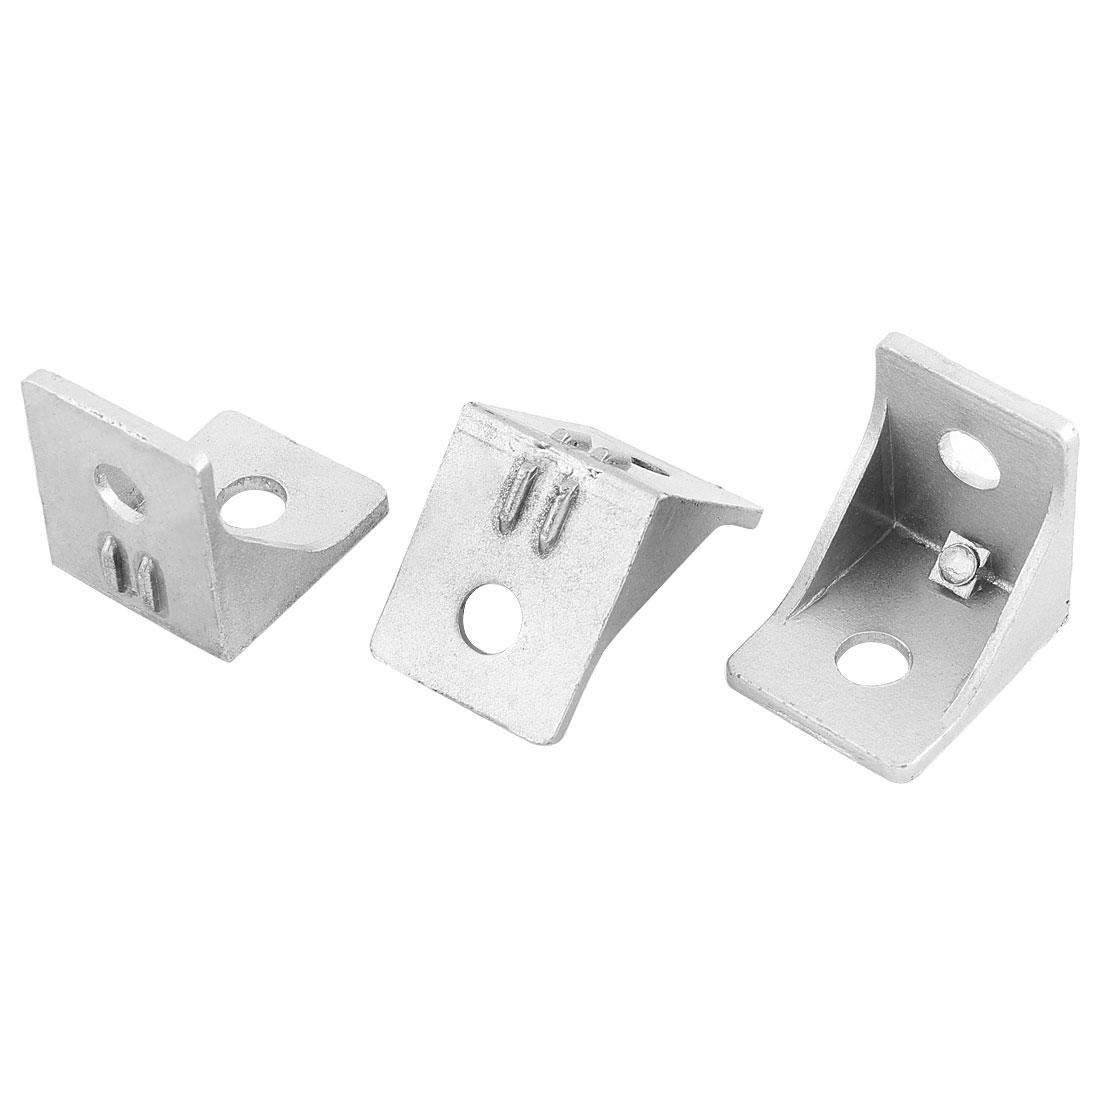 Silver Tone 30mmx30mm 2 Holes Right Angled Shelf Corner Brace Angle Bracket 3pcs